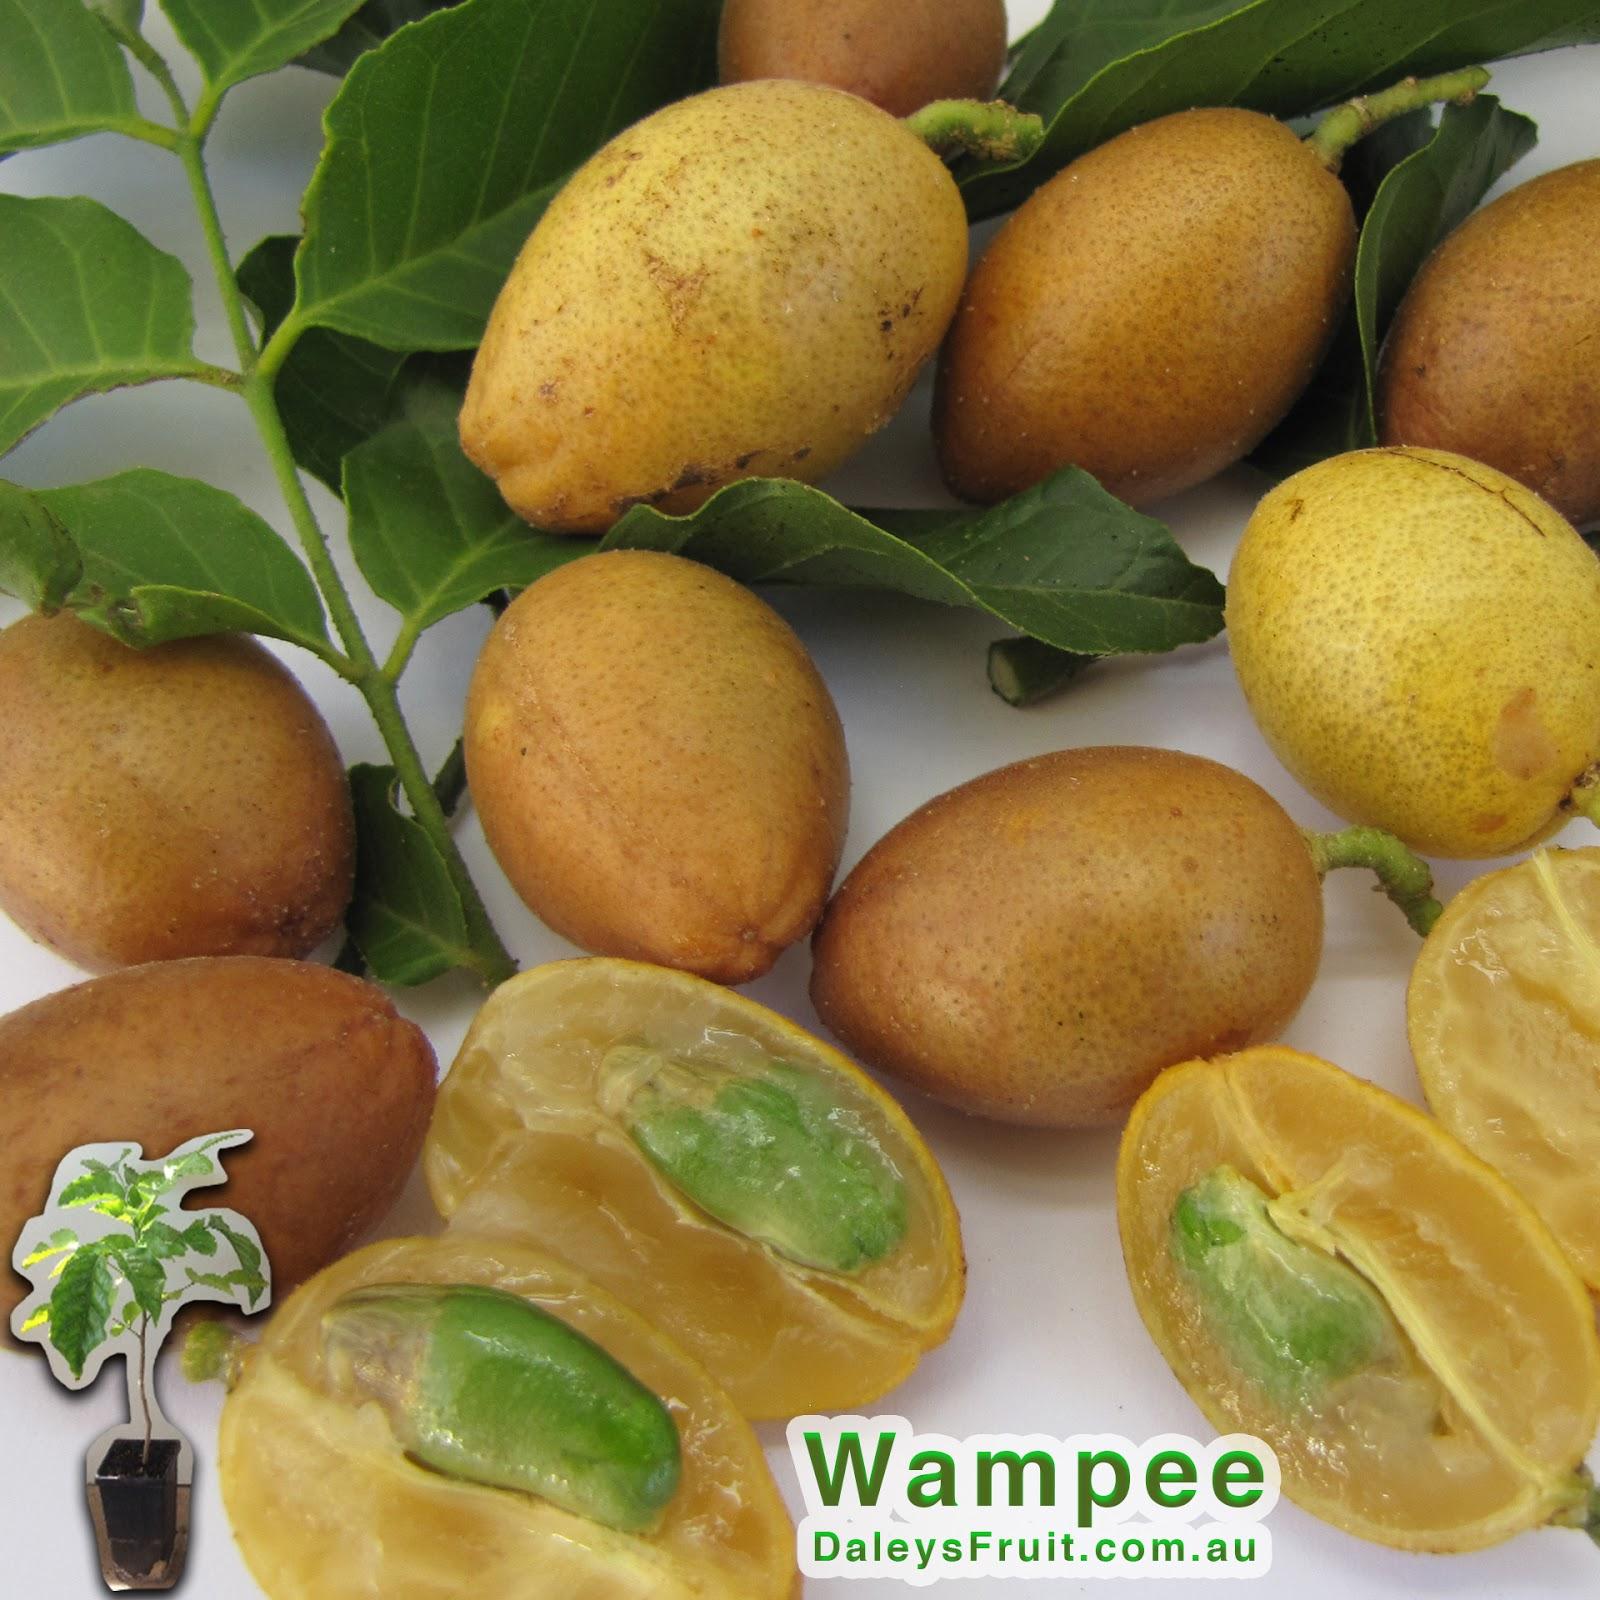 Daleys fruit tree blog wampee fruit trees for sale for Fruit trees for sale